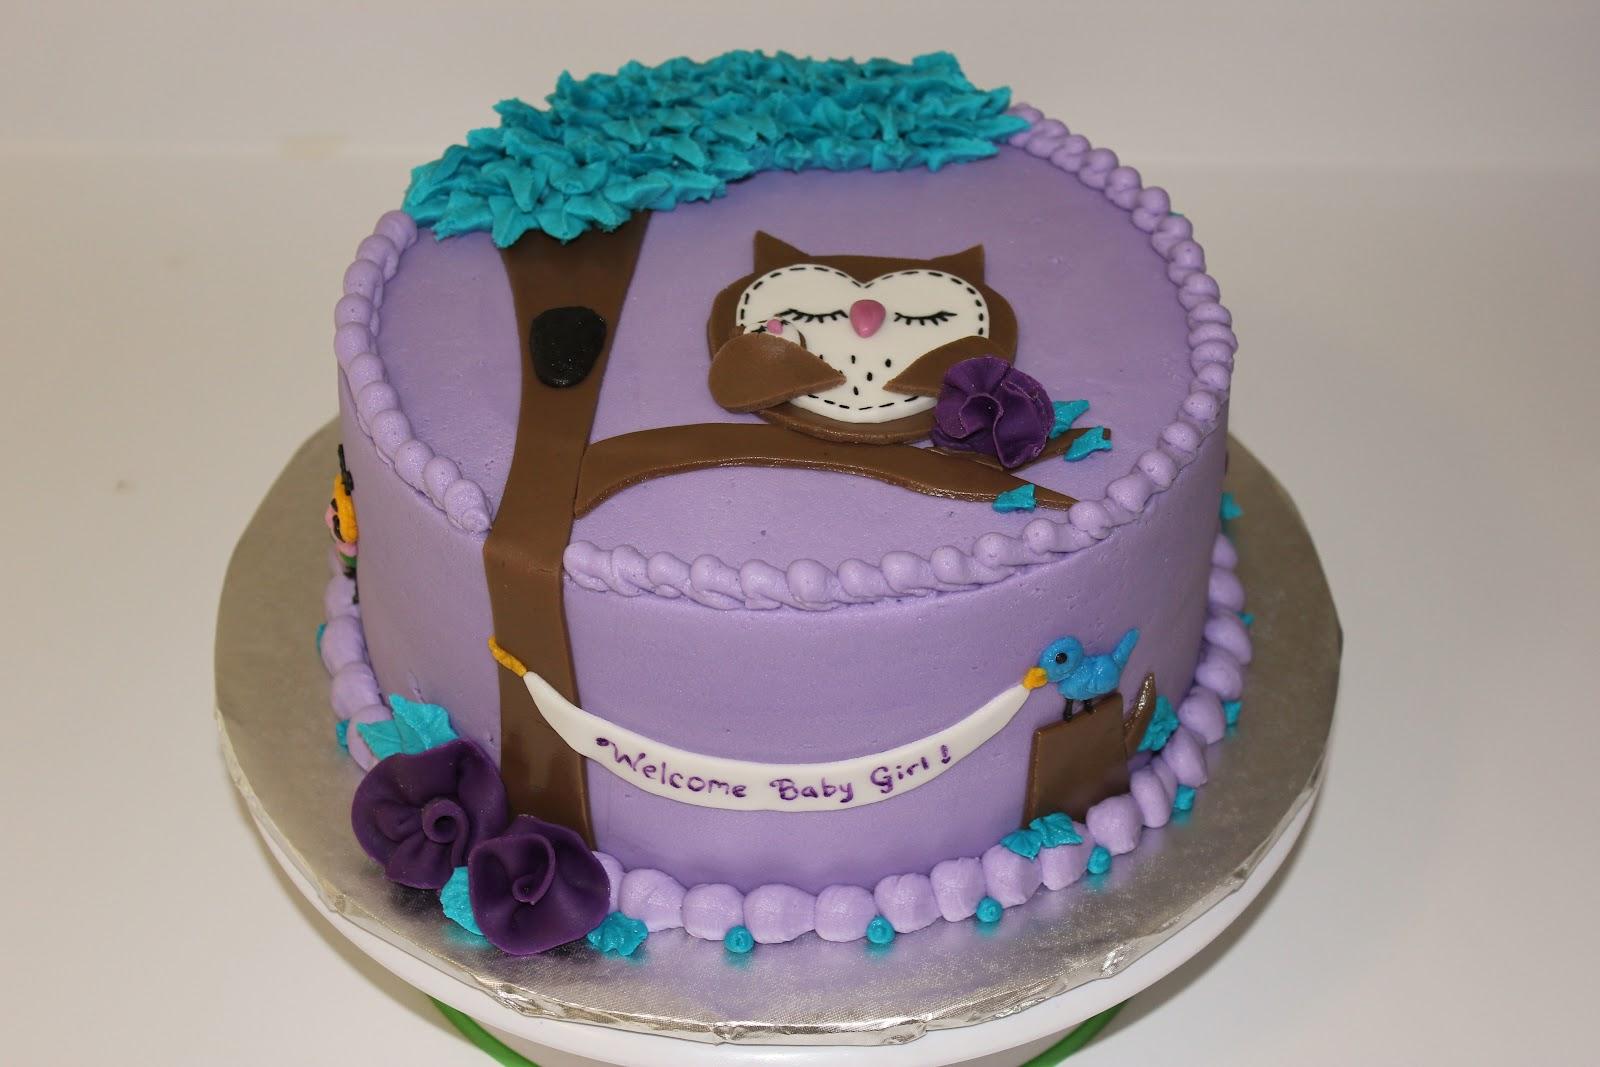 Blessed Hands Cake Design Owl Baby Shower Cake